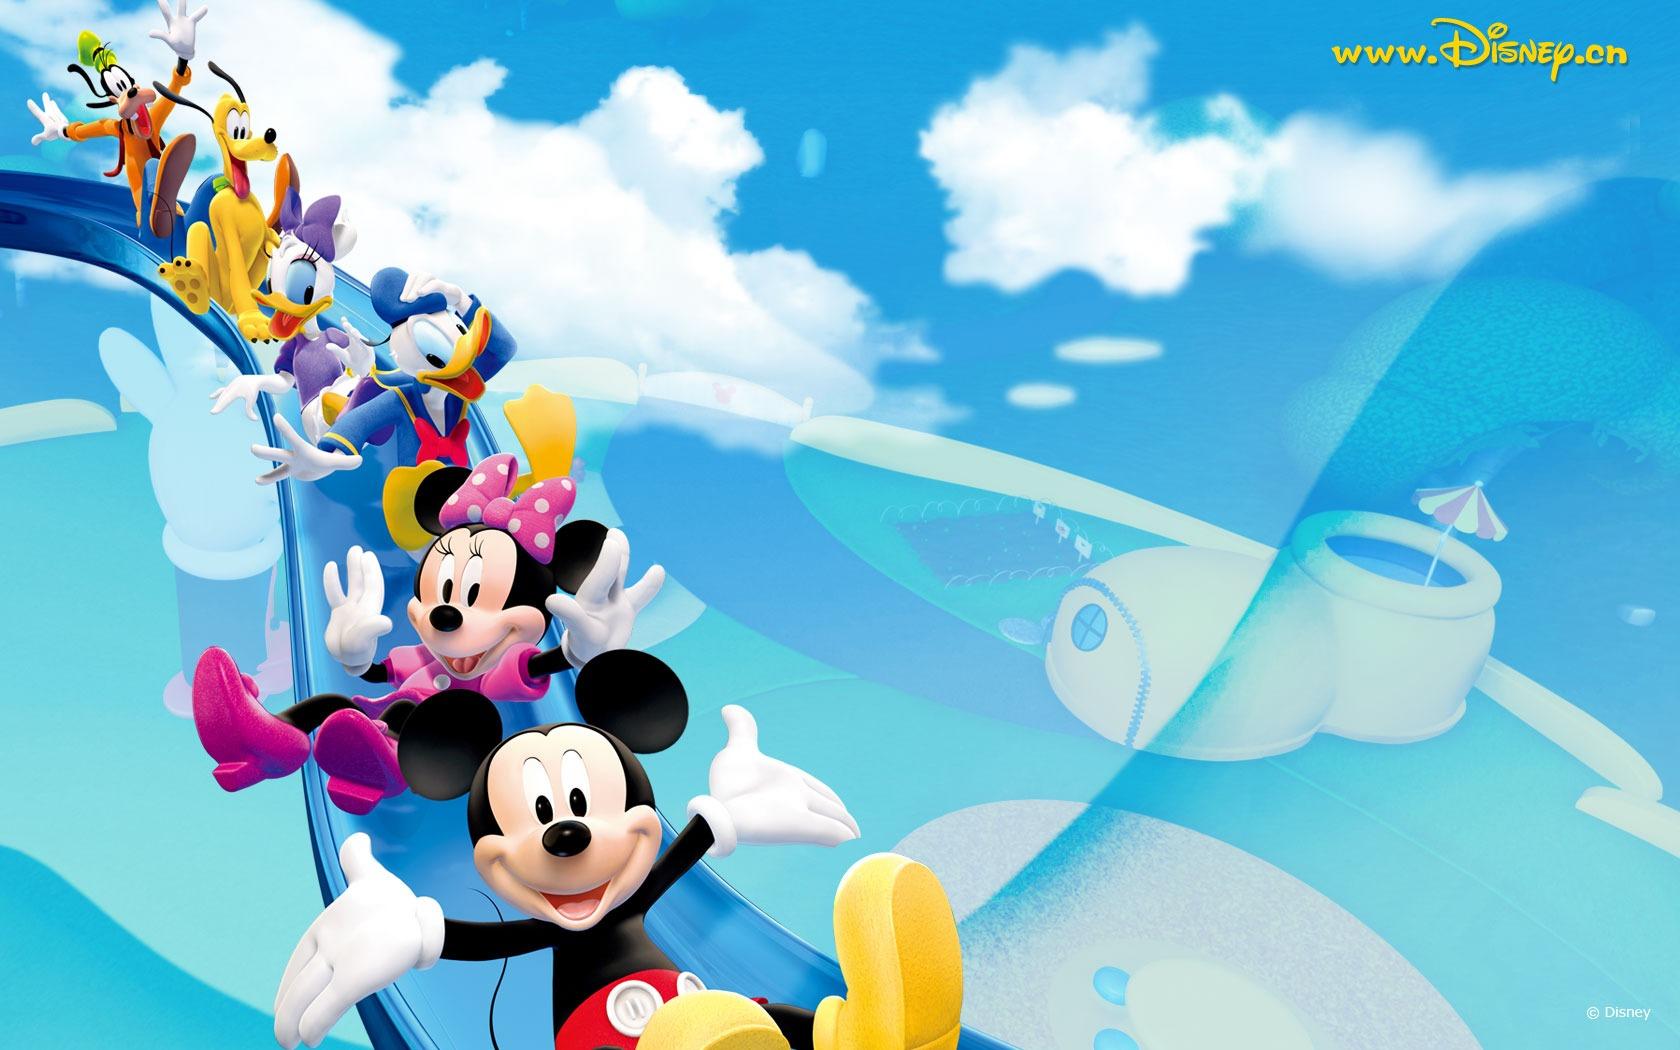 Free Wallpaper Download For Pc 3d Mickey Mouse Wallpaper Hd Pixelstalk Net